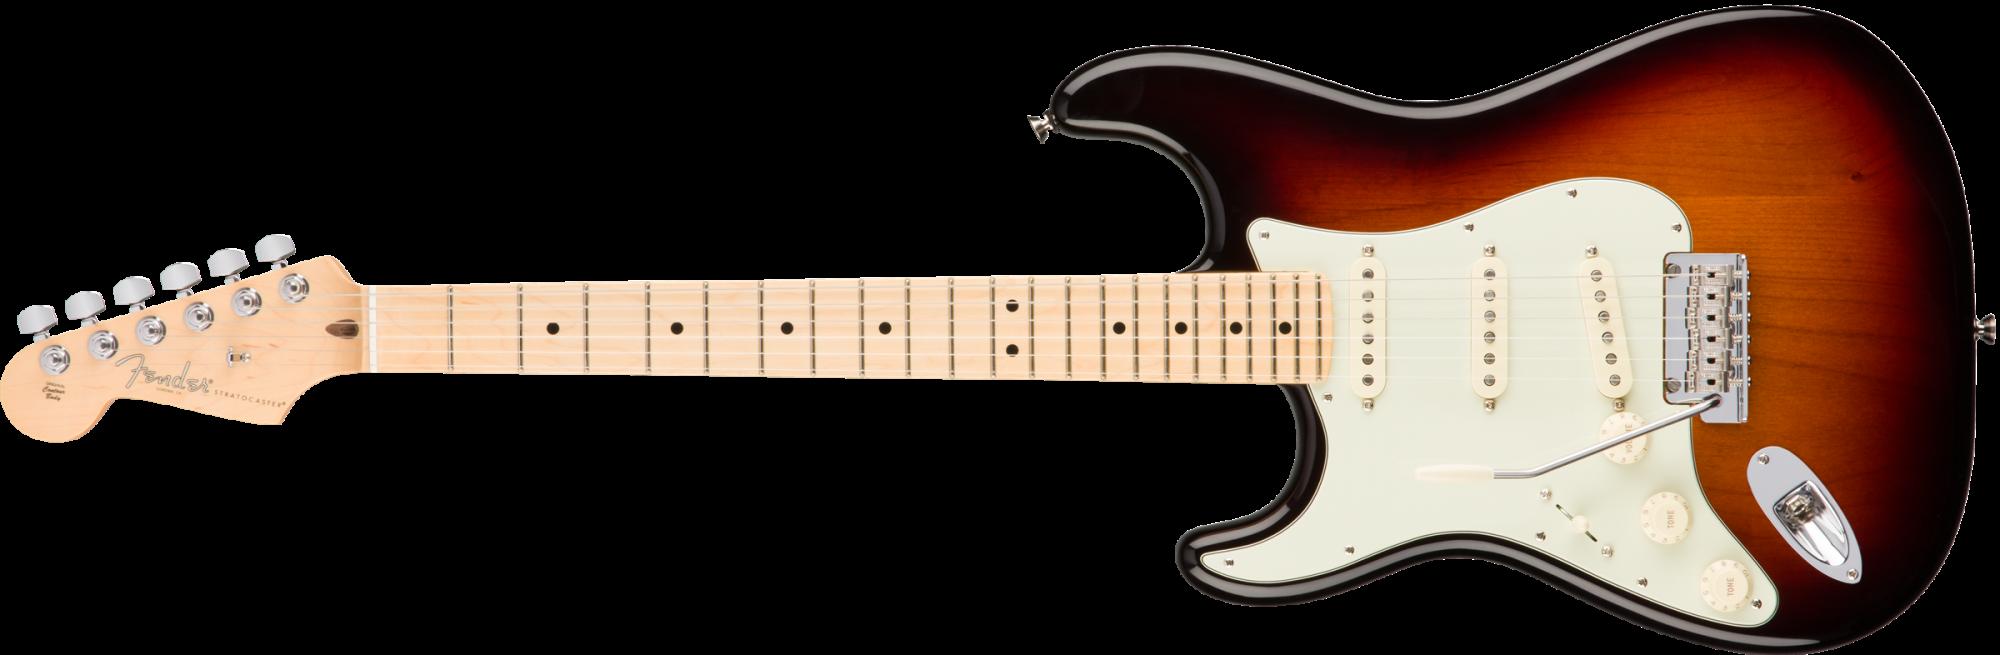 Fender American Pro Strat LH